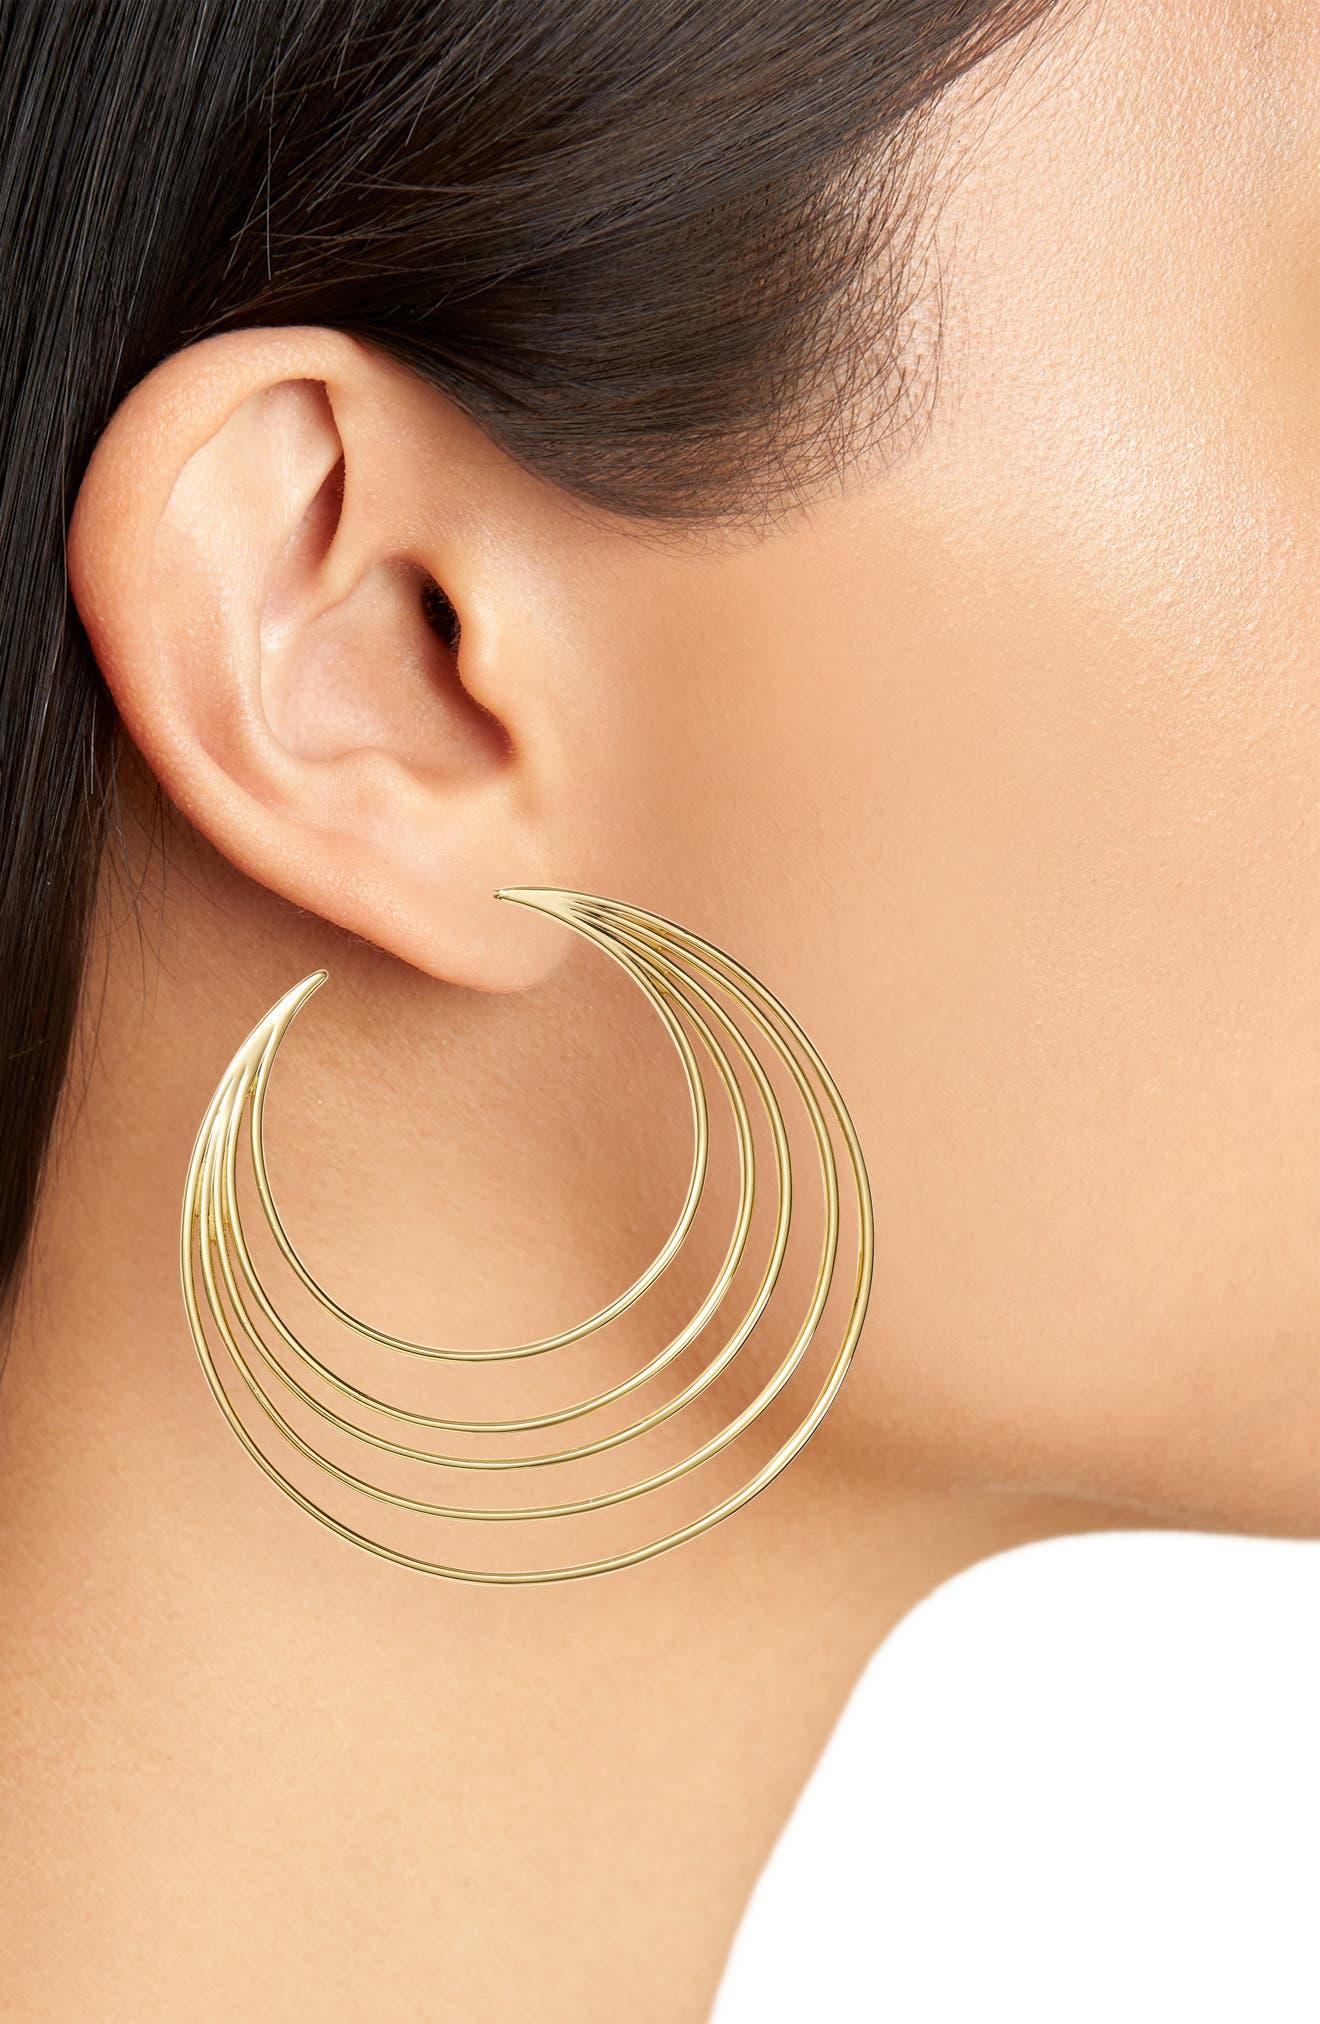 Casey Profile Hoop Earrings,                             Alternate thumbnail 2, color,                             710